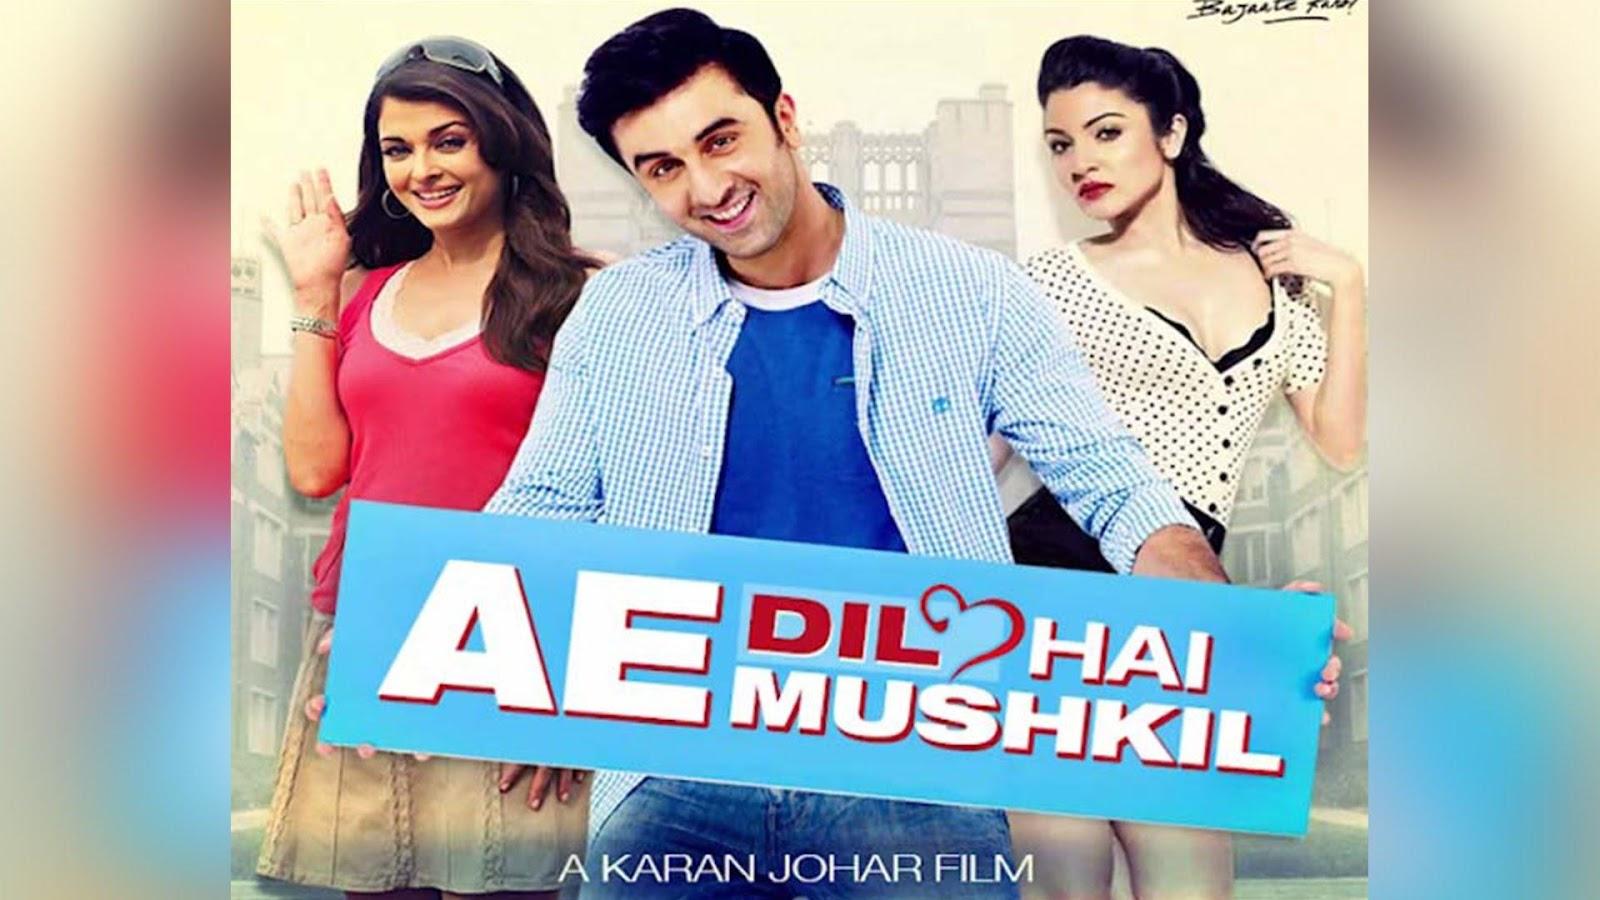 Movies In 2016, Mohenjo Daro, Rustom, M.S. Dhoni The Untold Story, Akira, Baar Baar Dekho, Ae Dil Hai Mushkil, Dear Zindagi, Befikre, Dangal, Raees